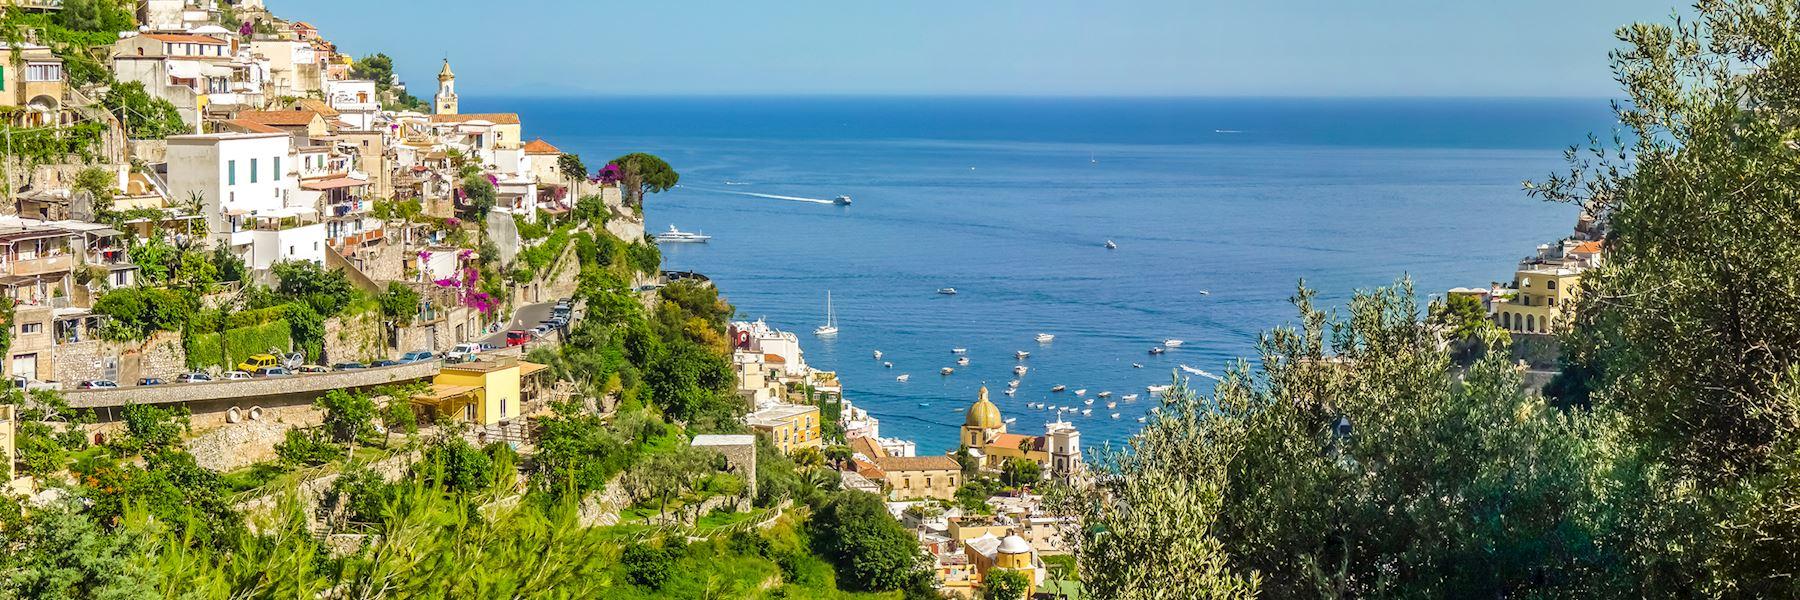 Italy trip ideas